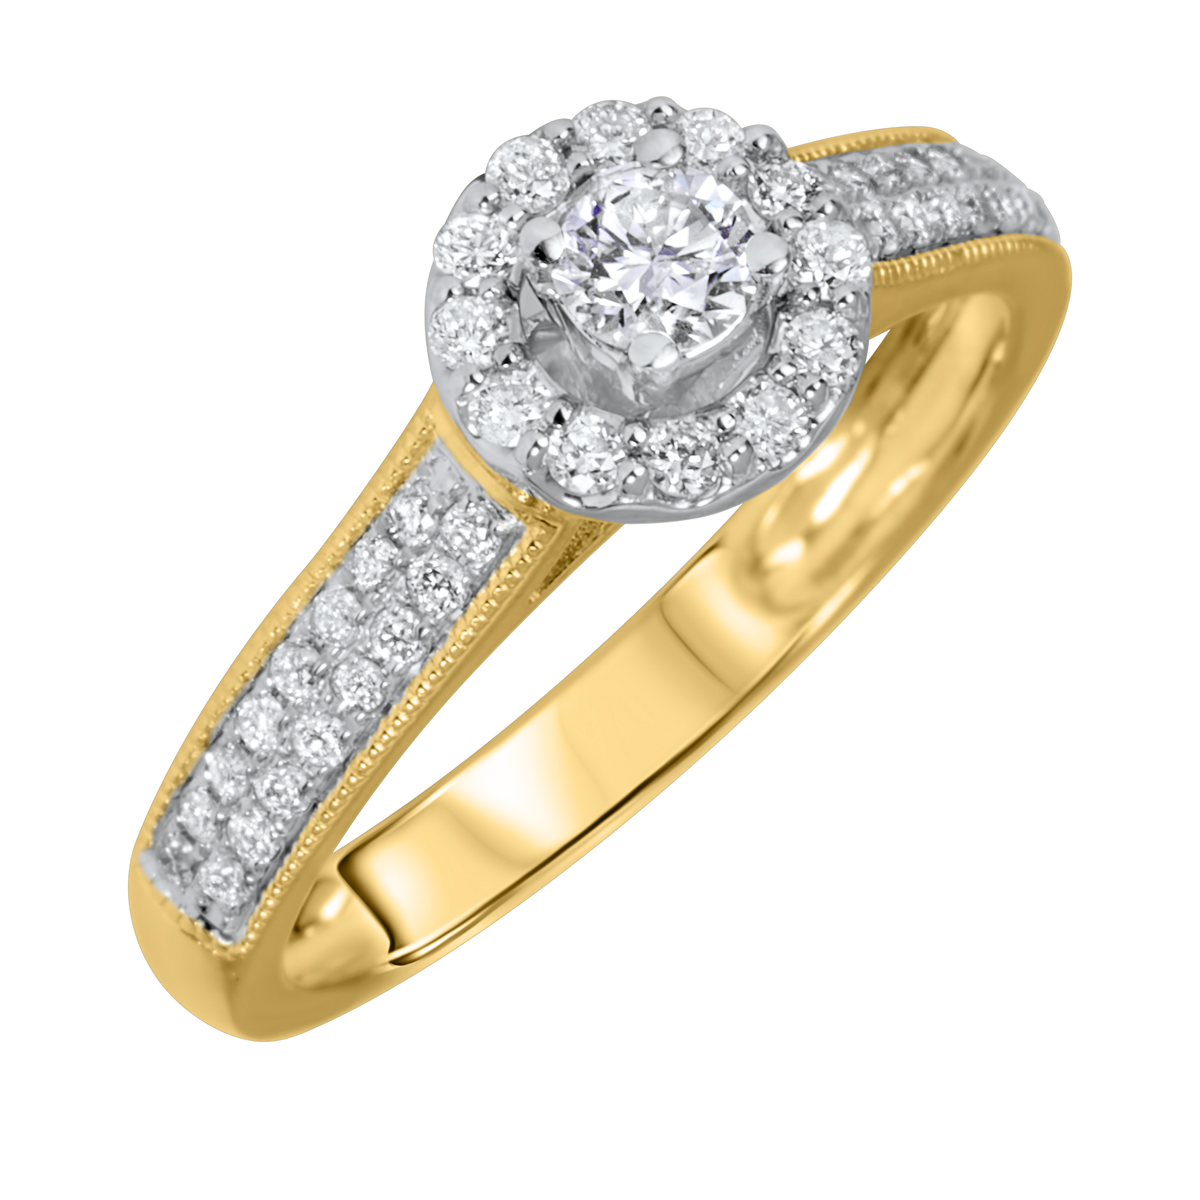 1/2 Carat T.W. Round Cut Diamond Ladies Engagement Ring 14K Yellow Gold- Size 8